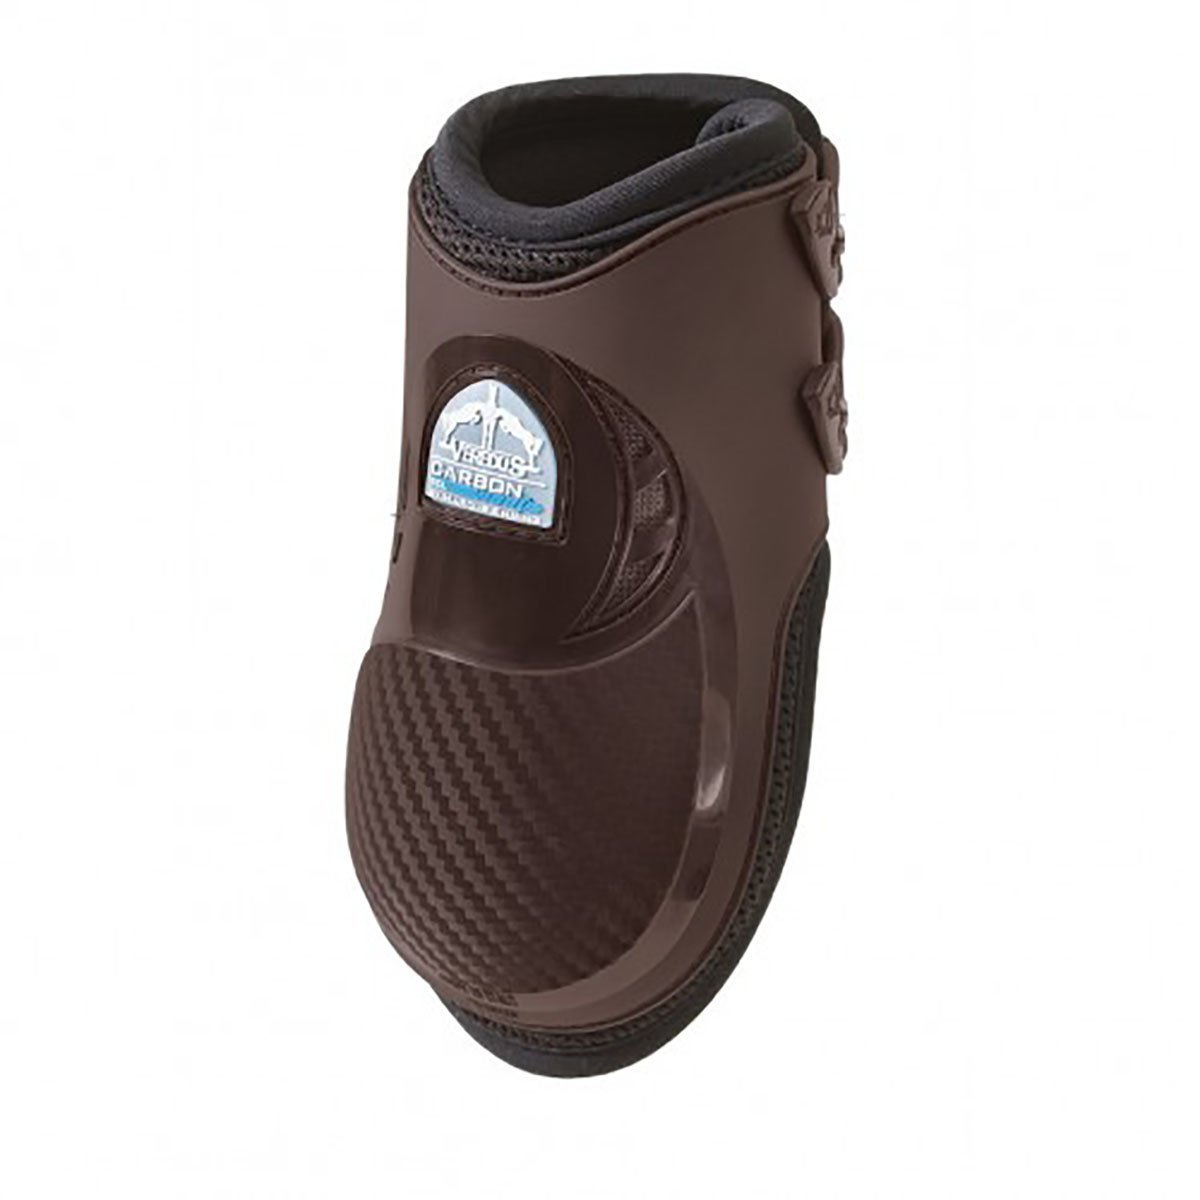 Veredus – カーボンジェル背面 – Horse Boots – Made in Italy B07G2LW52S  ブラウン Small: H 5\, ファルコン 5f347747